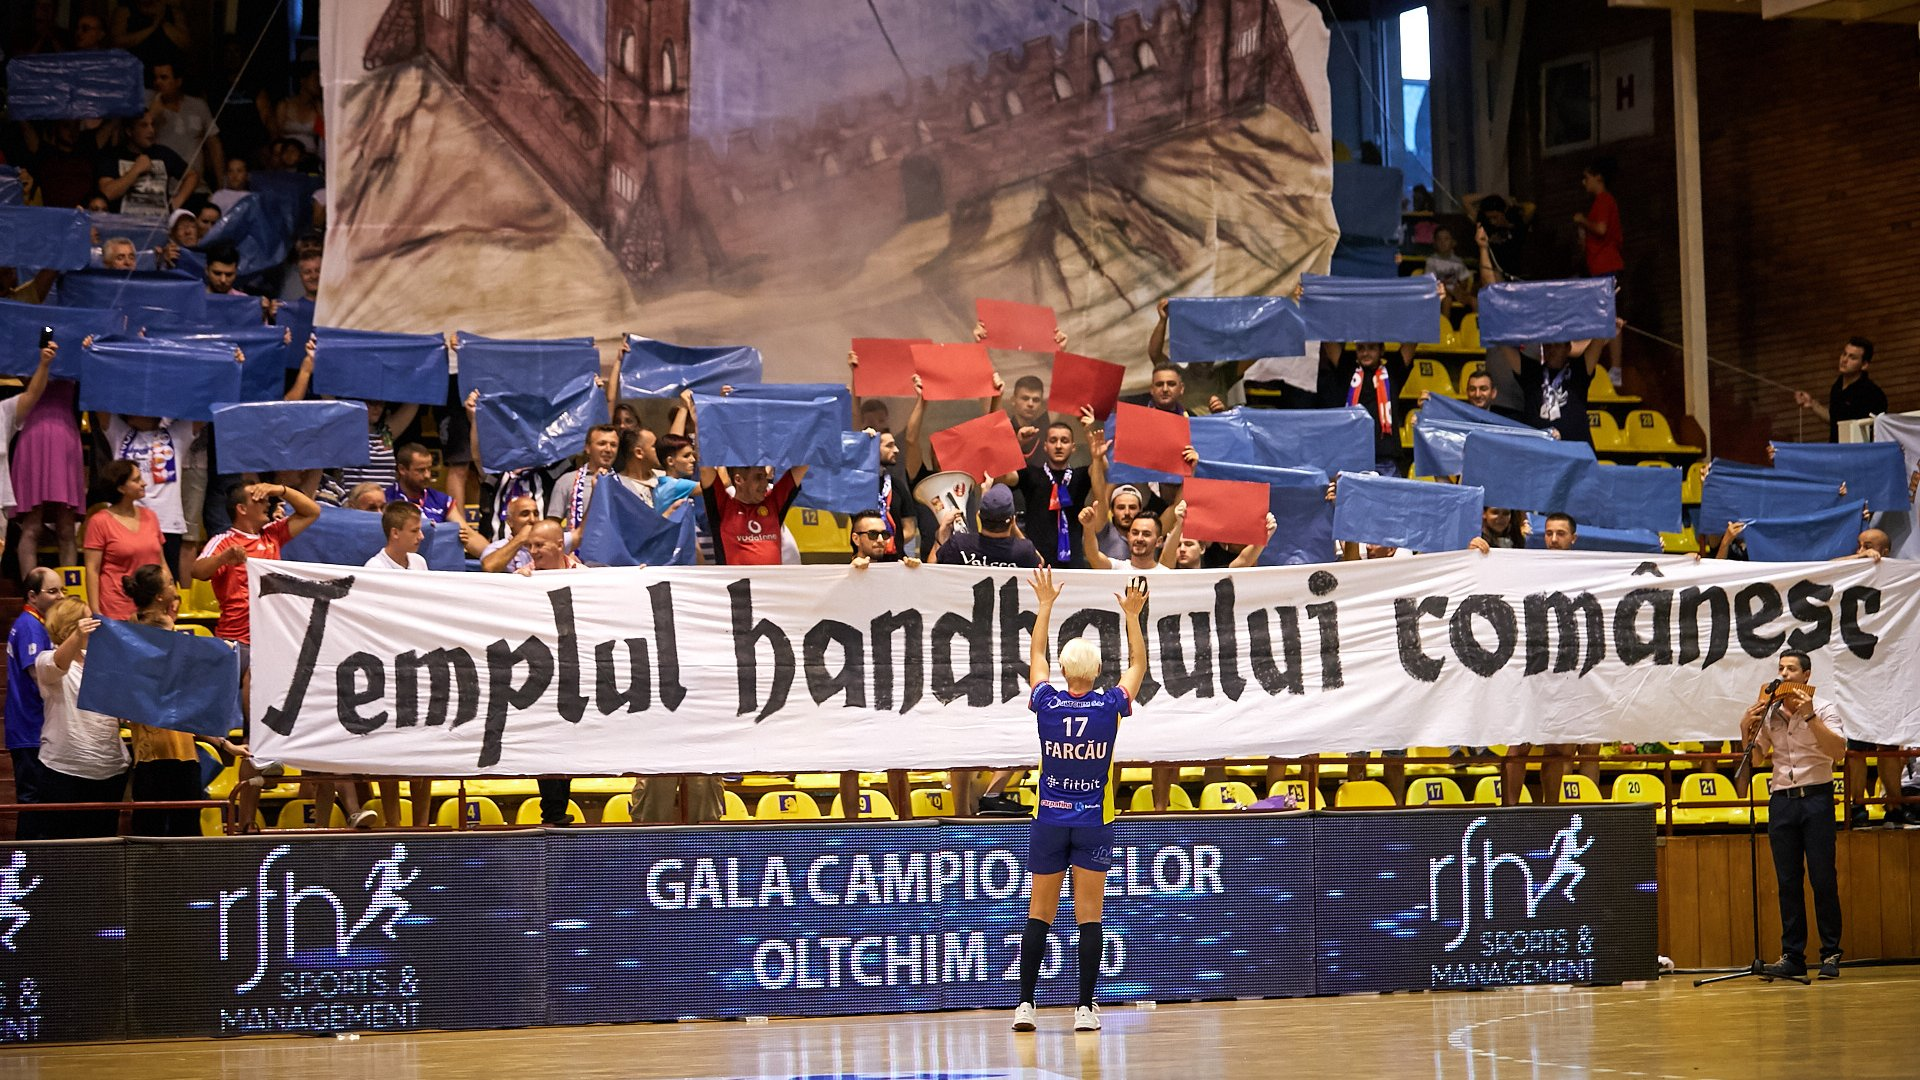 rfh-gala-campioanelor-oltchim-2010